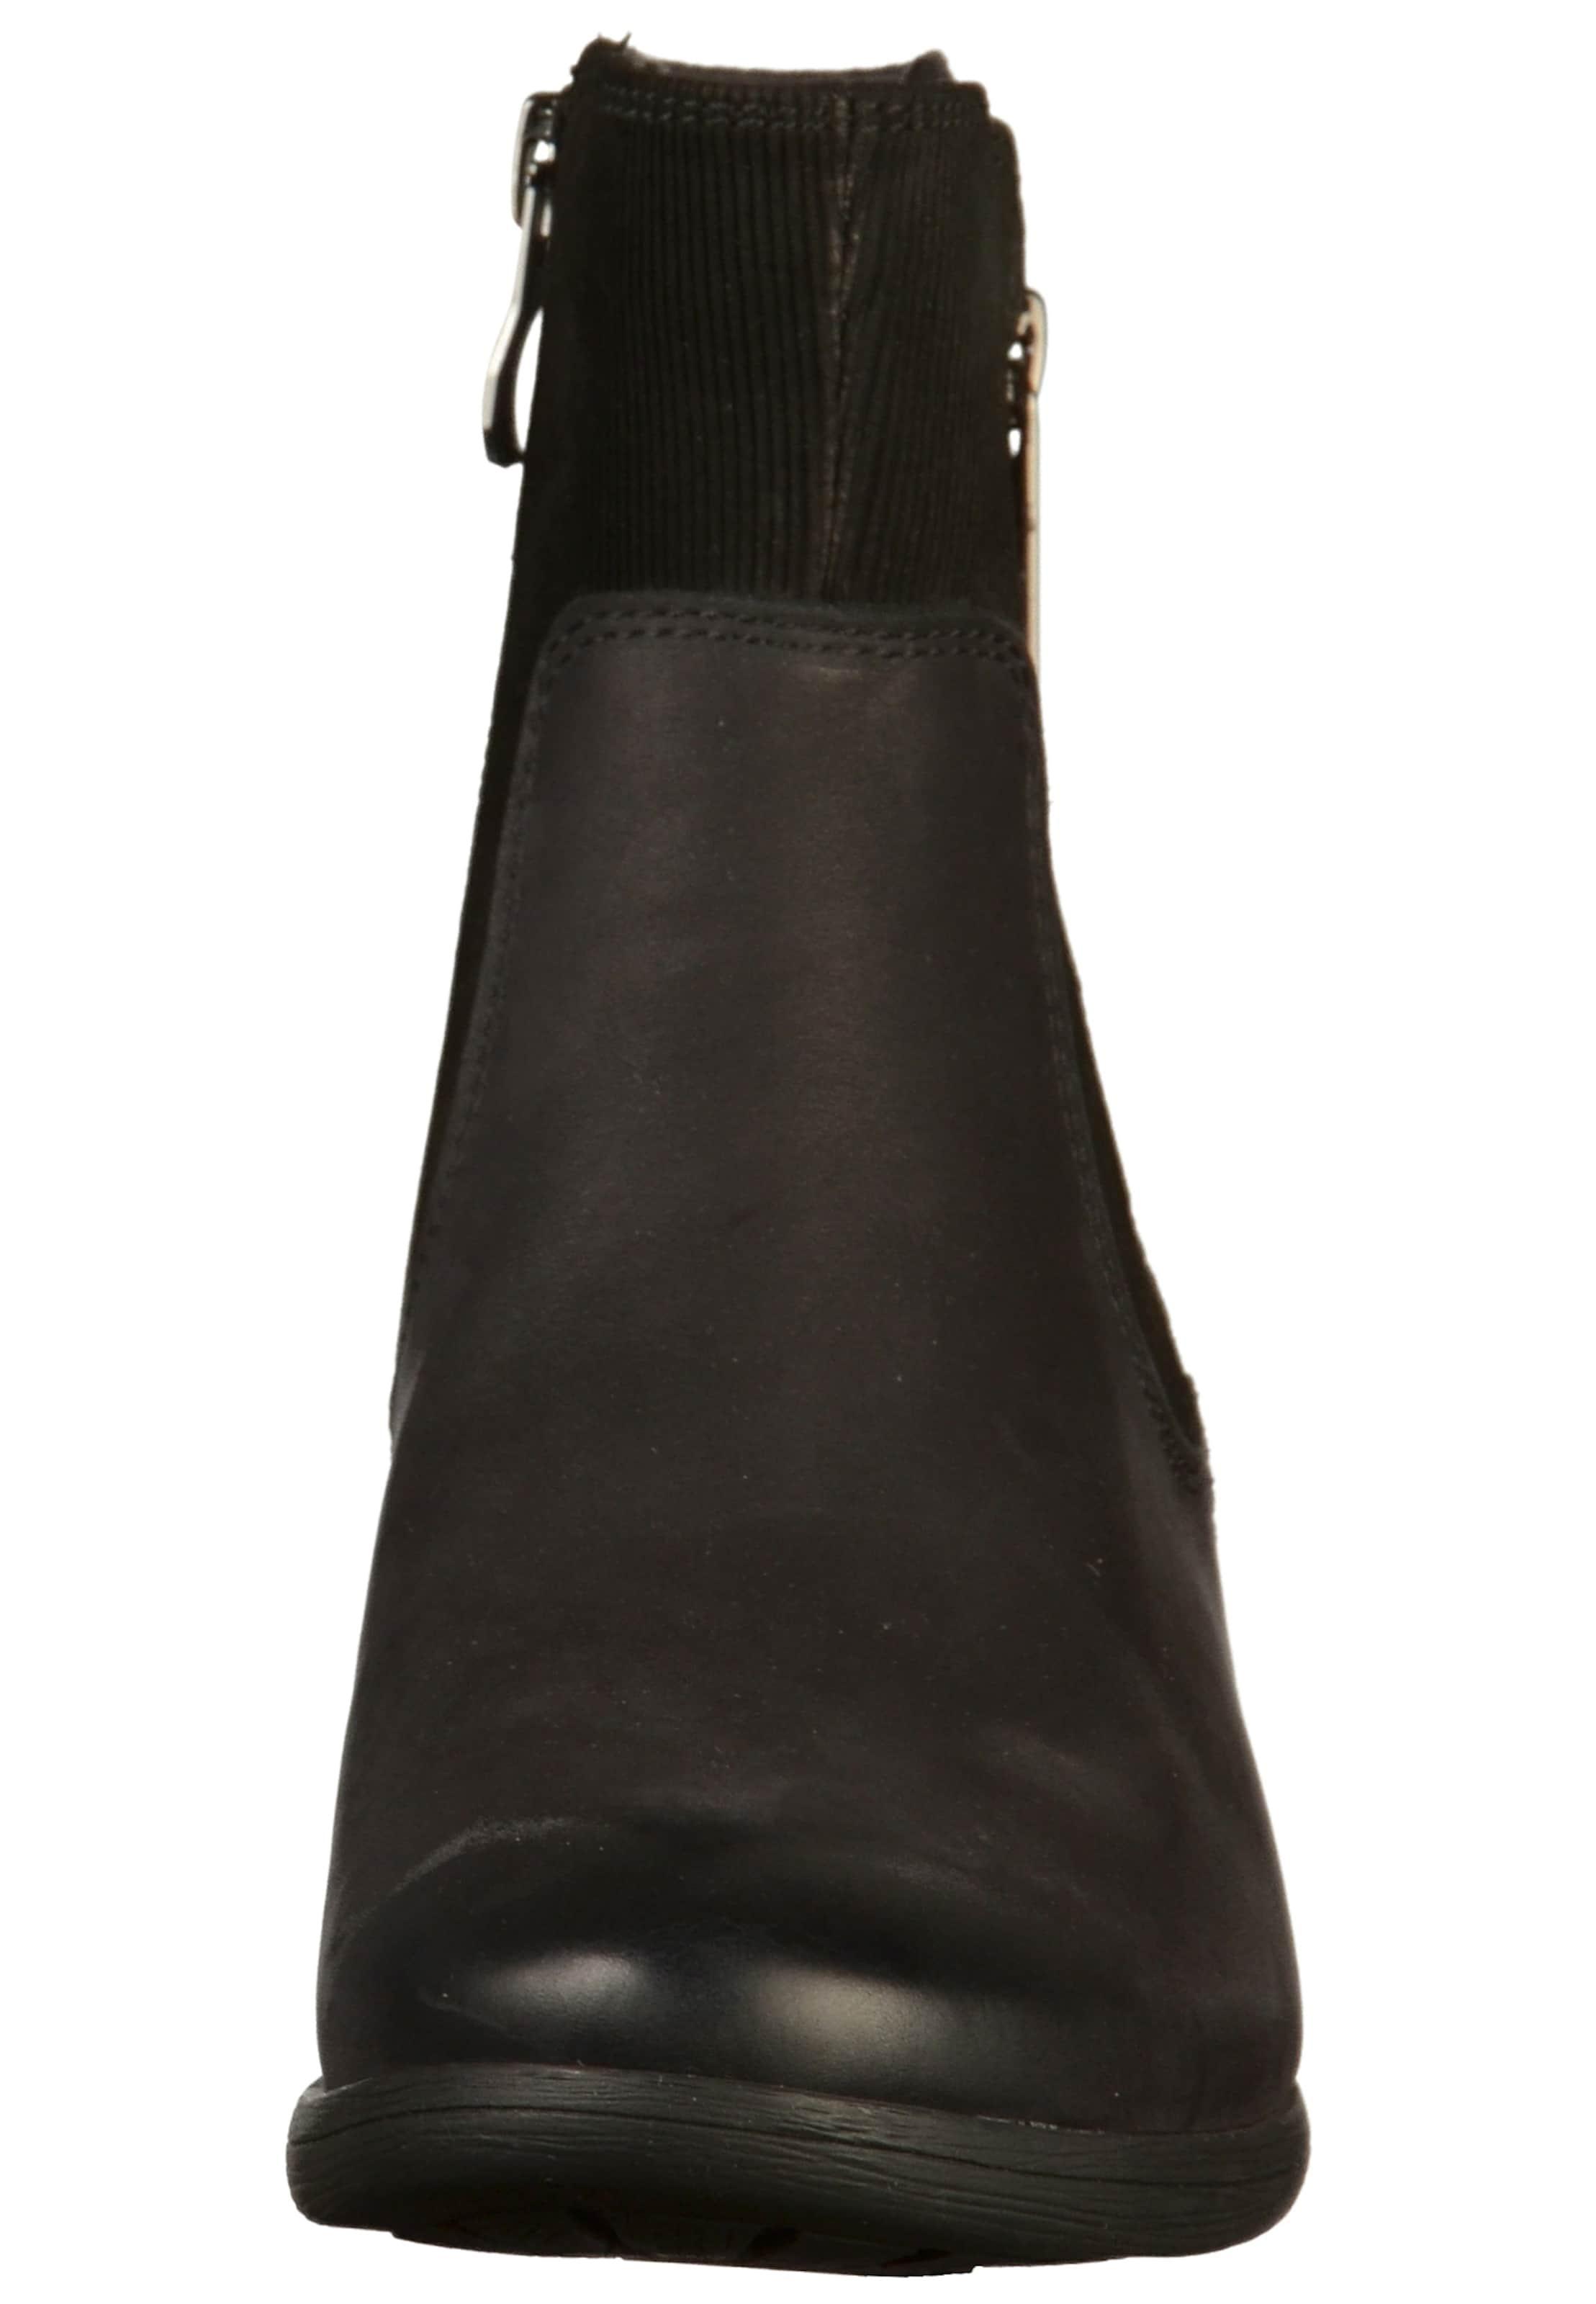 En Noir Caprice Bottines Caprice Bottines Bottines En Caprice Noir Noir Bottines En Caprice D9EH2I